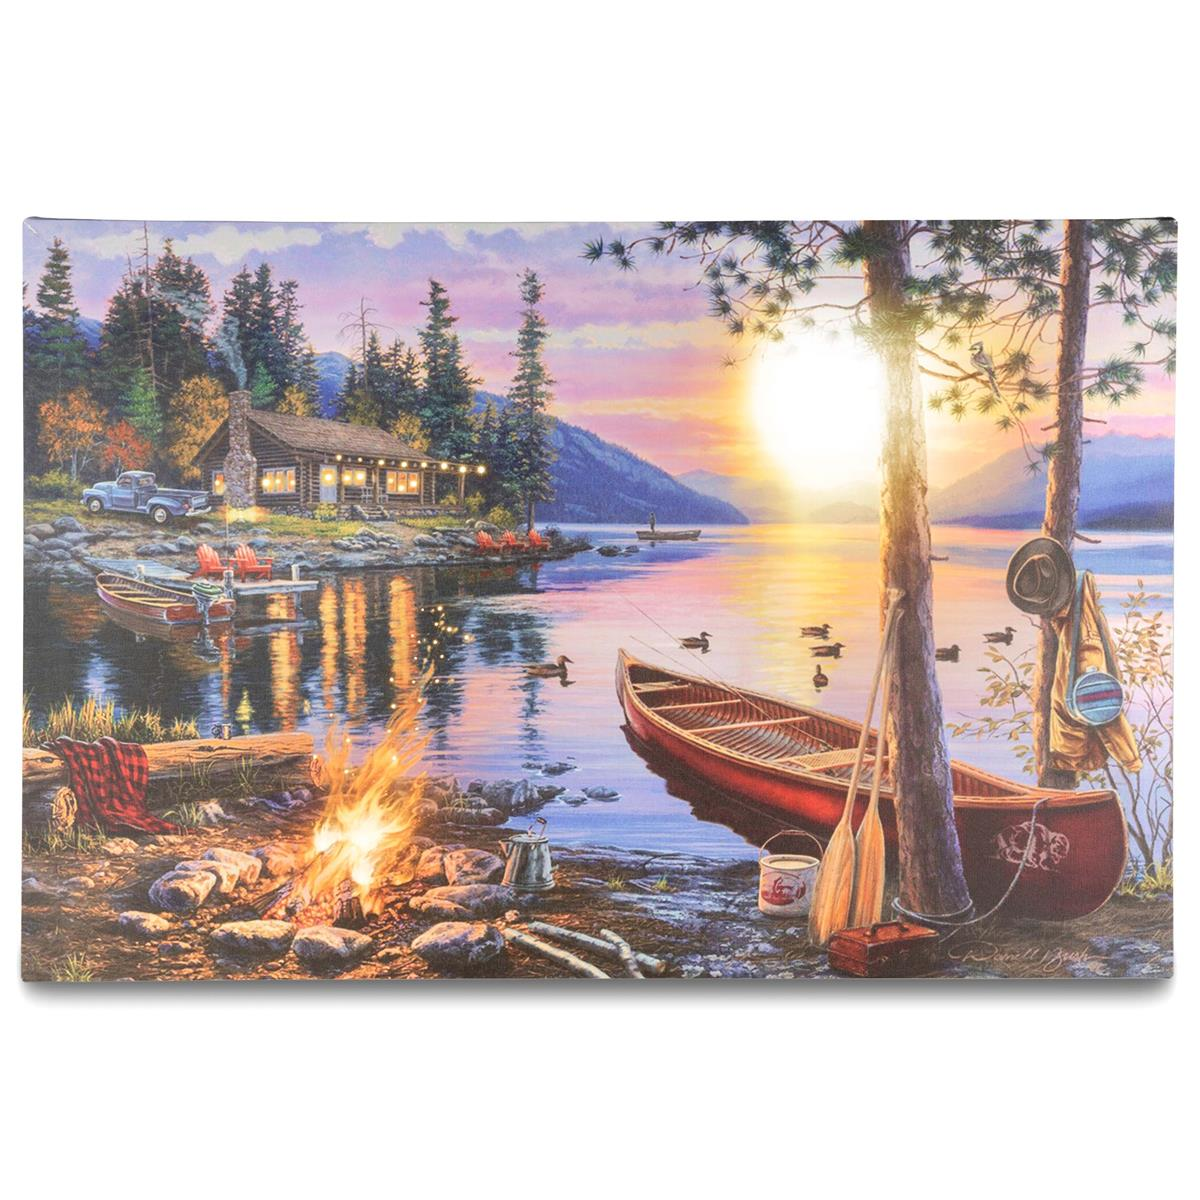 Wandbild 4 LED Kunstdruck mit Beleuchtung Sonnenuntergang Kanada 40x60cm Batteri